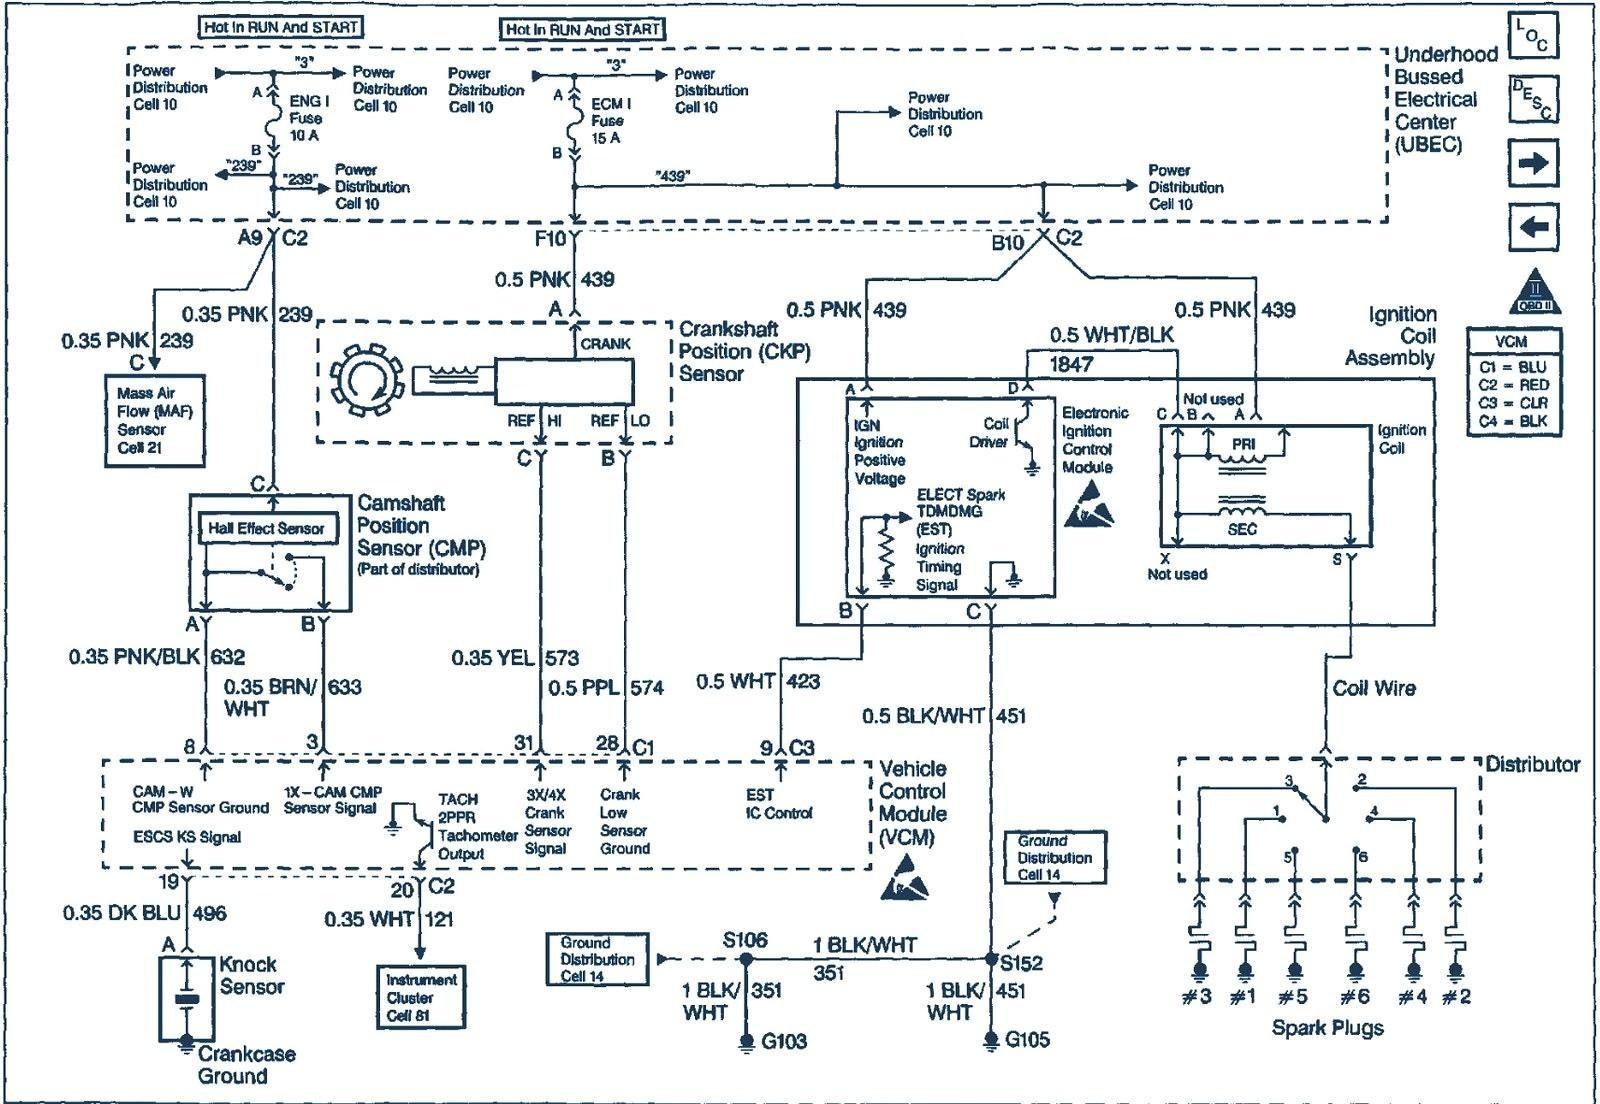 2005 w4500 wiring diagram ck 9389  isuzu npr alternator wiring diagram further isuzu npr  isuzu npr alternator wiring diagram